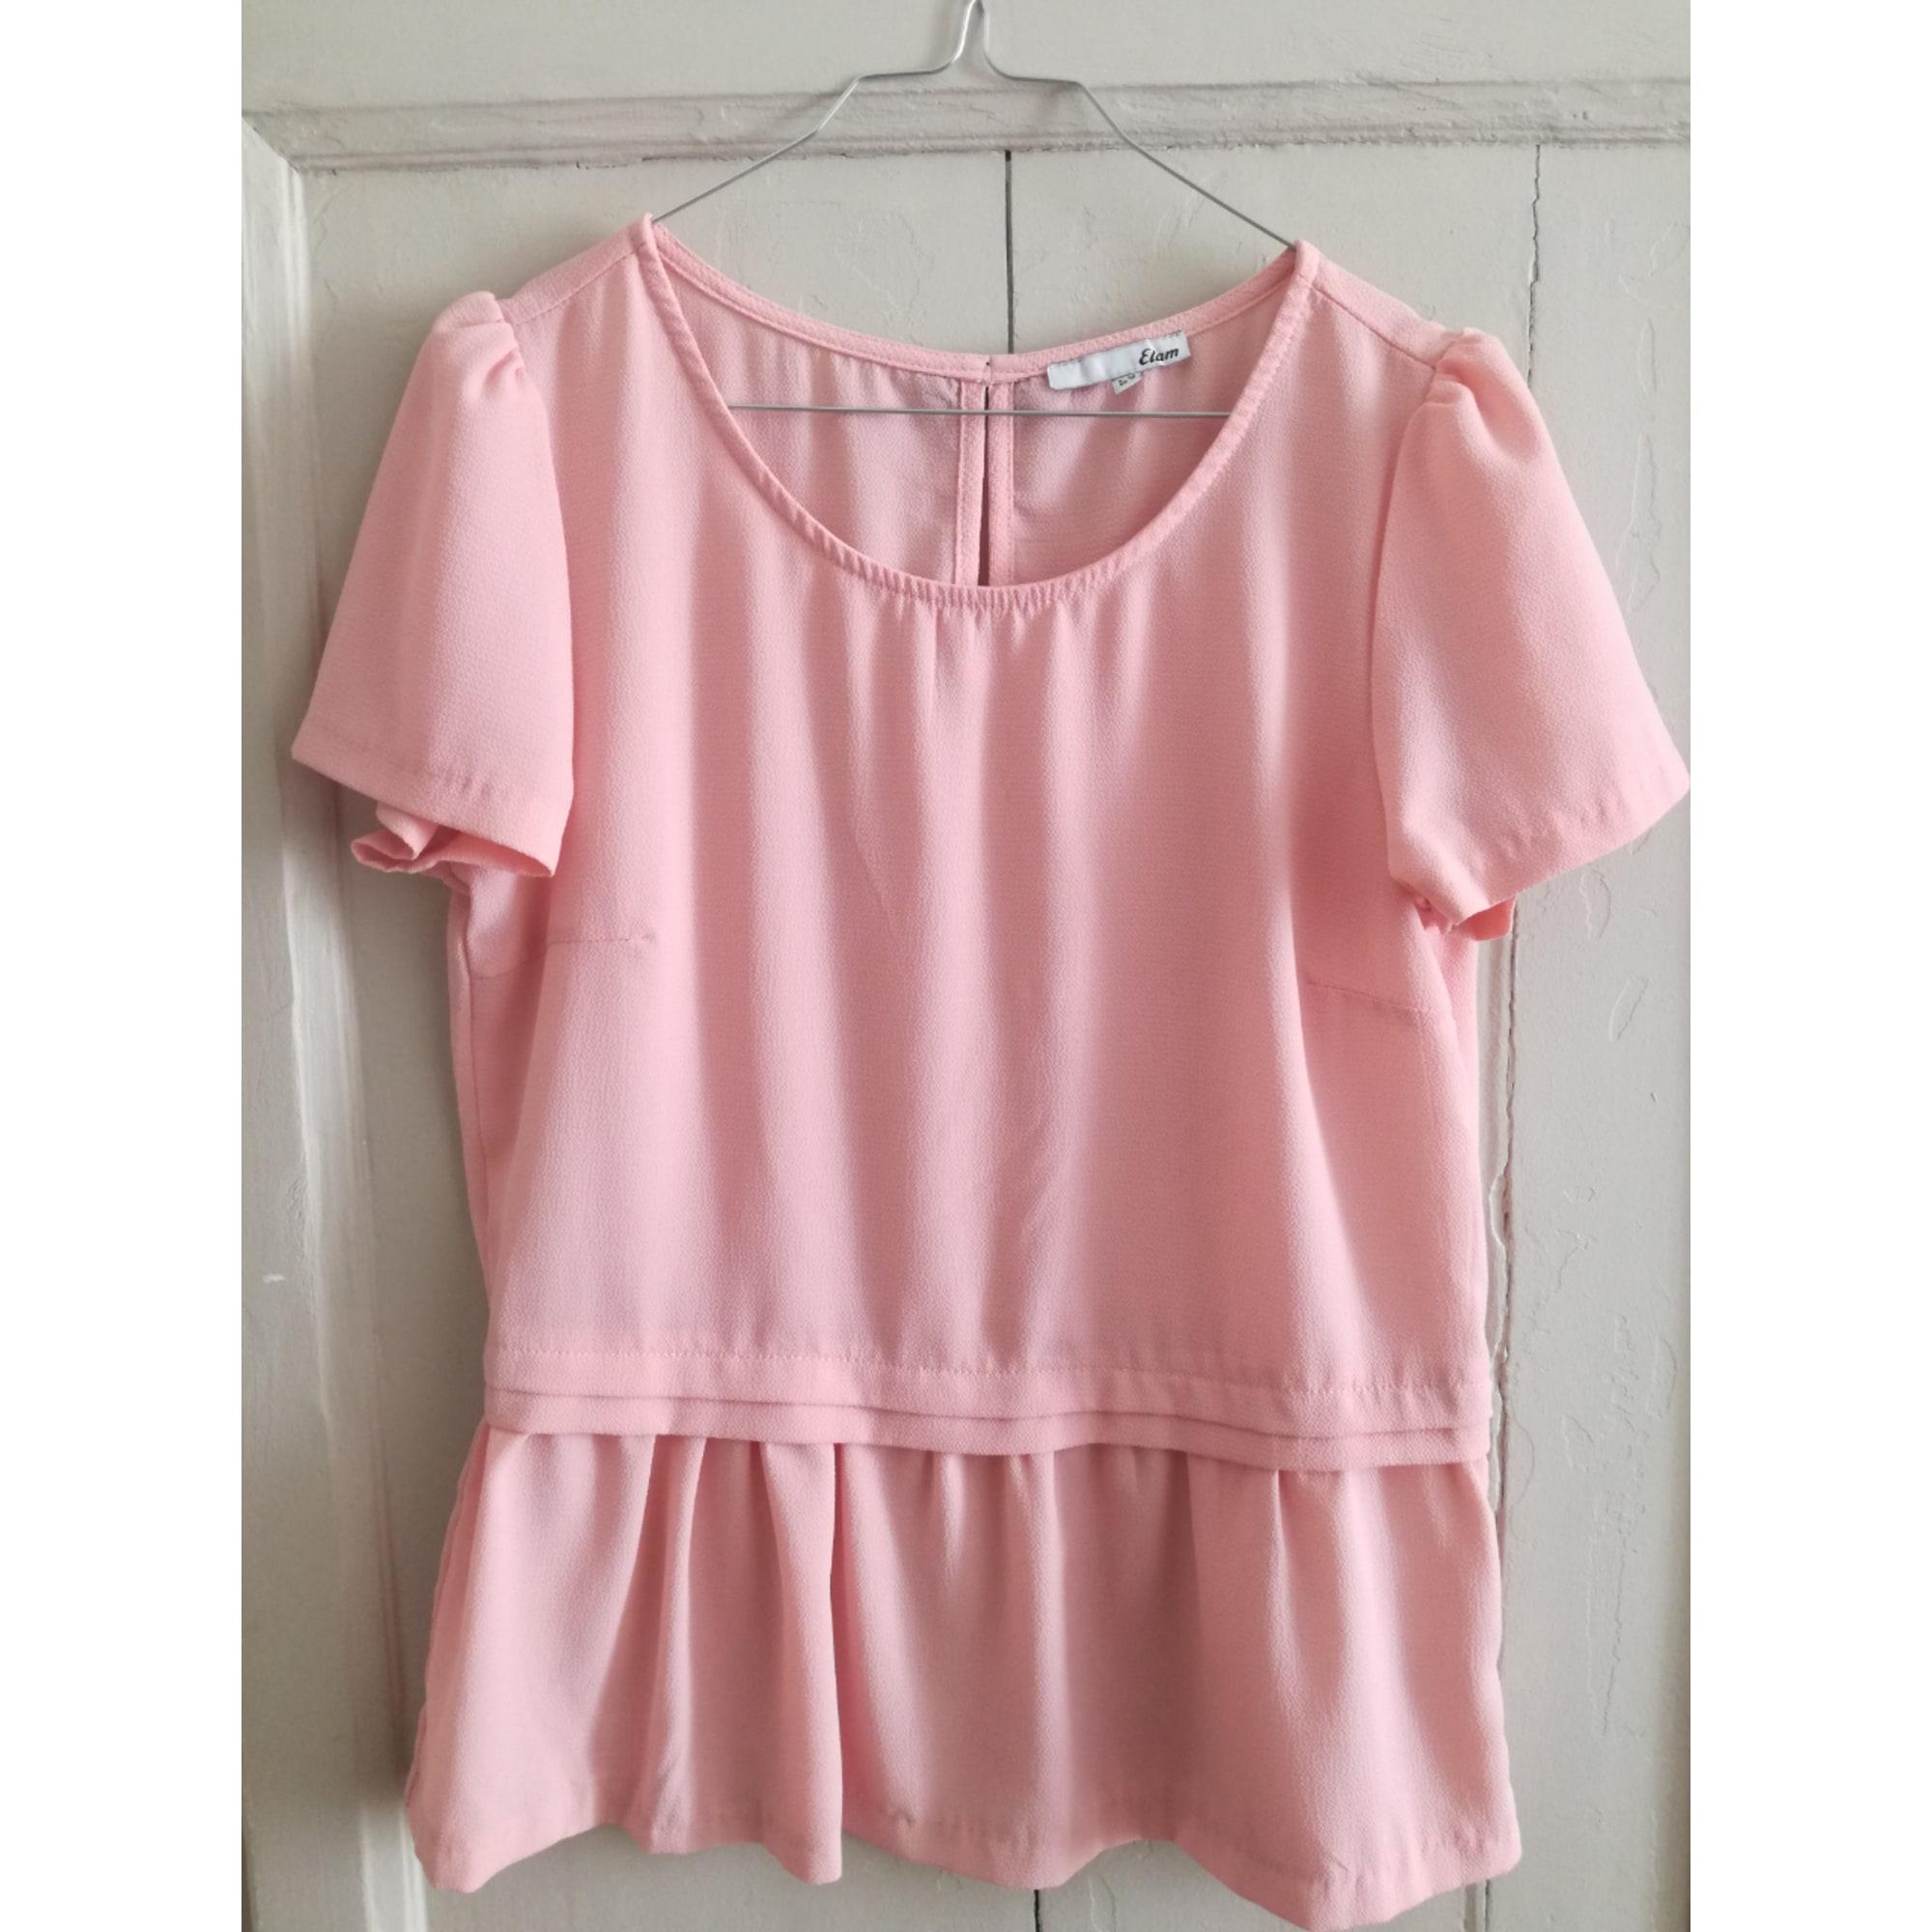 Top, tee-shirt ETAM Rose, fuschia, vieux rose